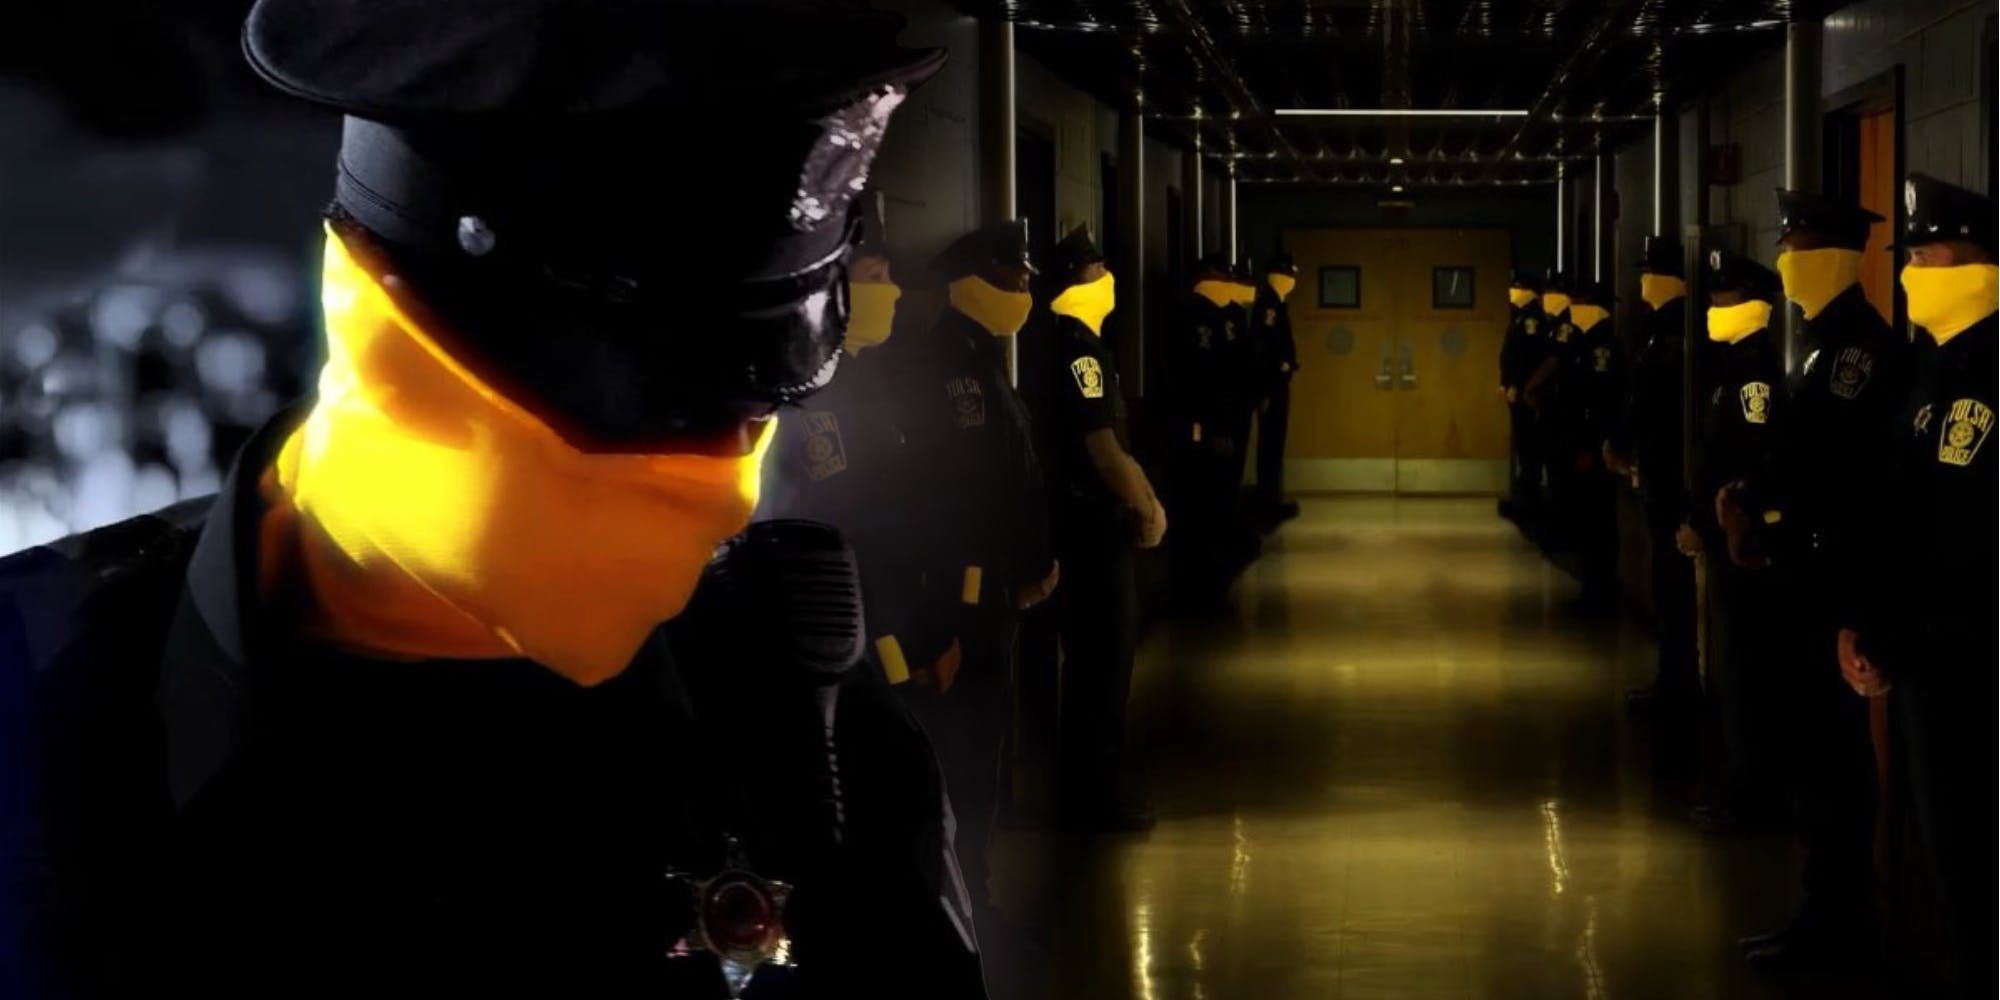 La serie Watchmen de HBO libera teaser tráiler rumbo a su estreno